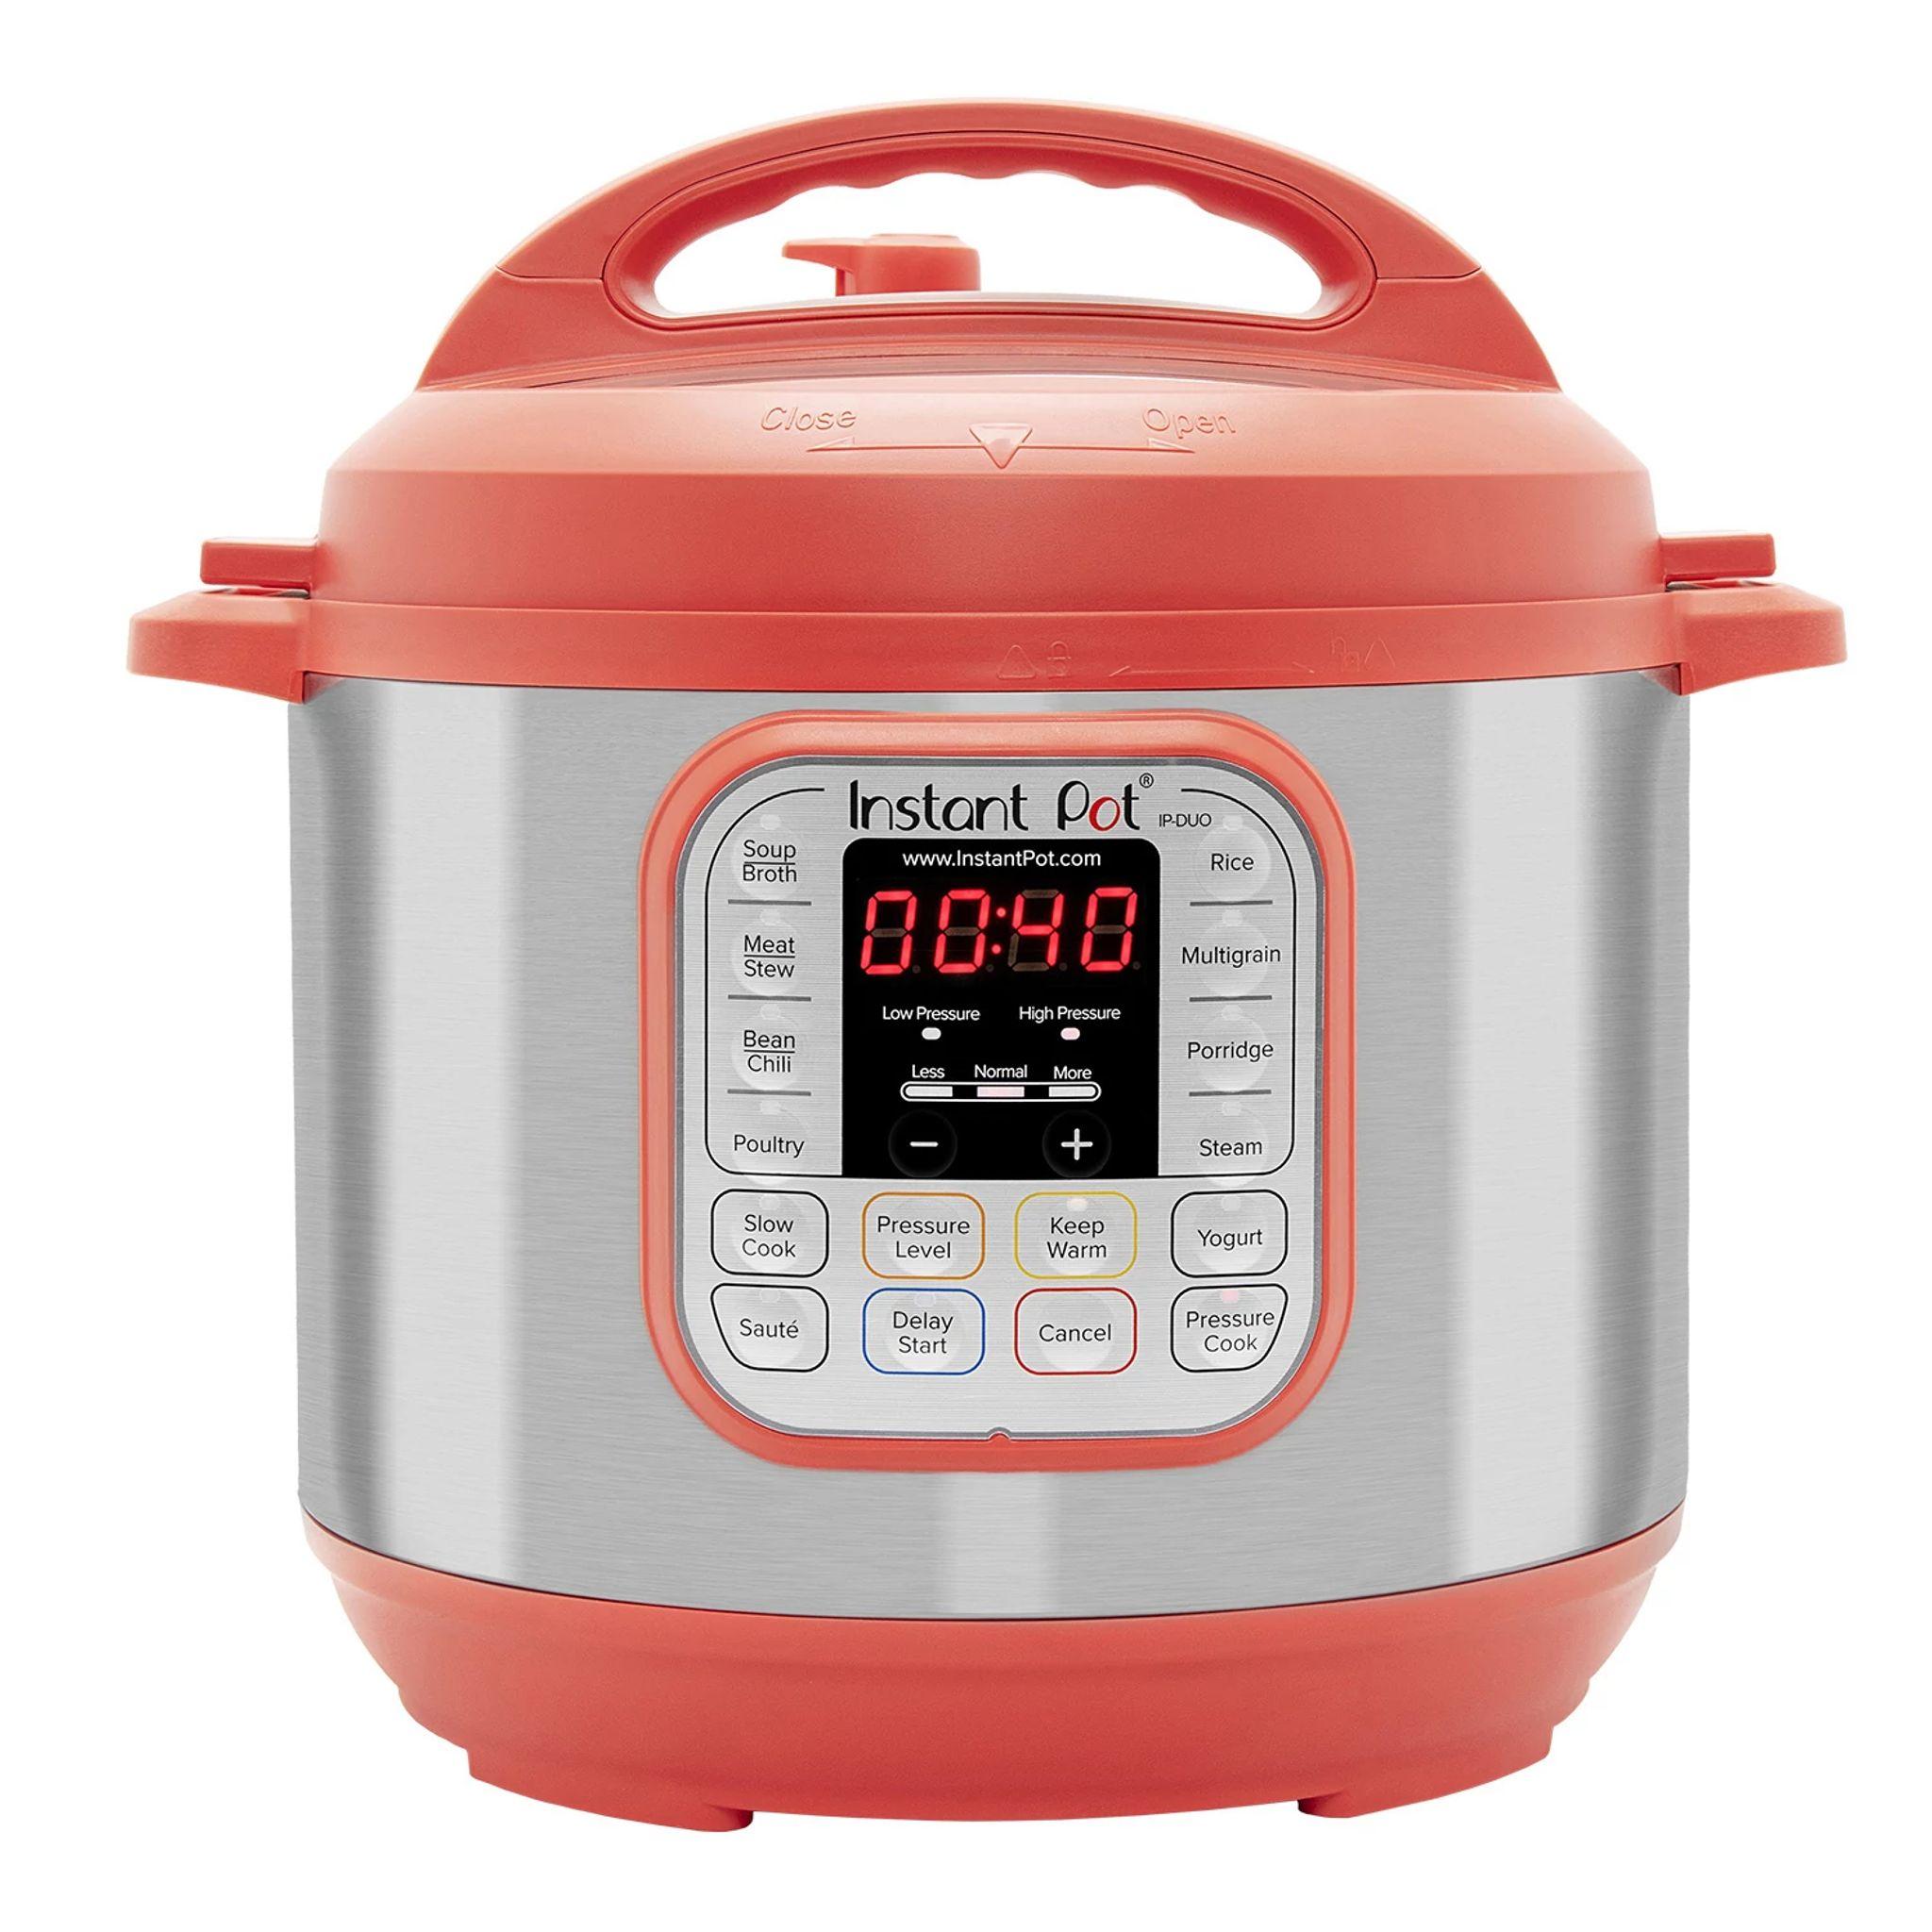 Instant Pot Duo 6-quart Multi-Use Pressure Cooker, Red